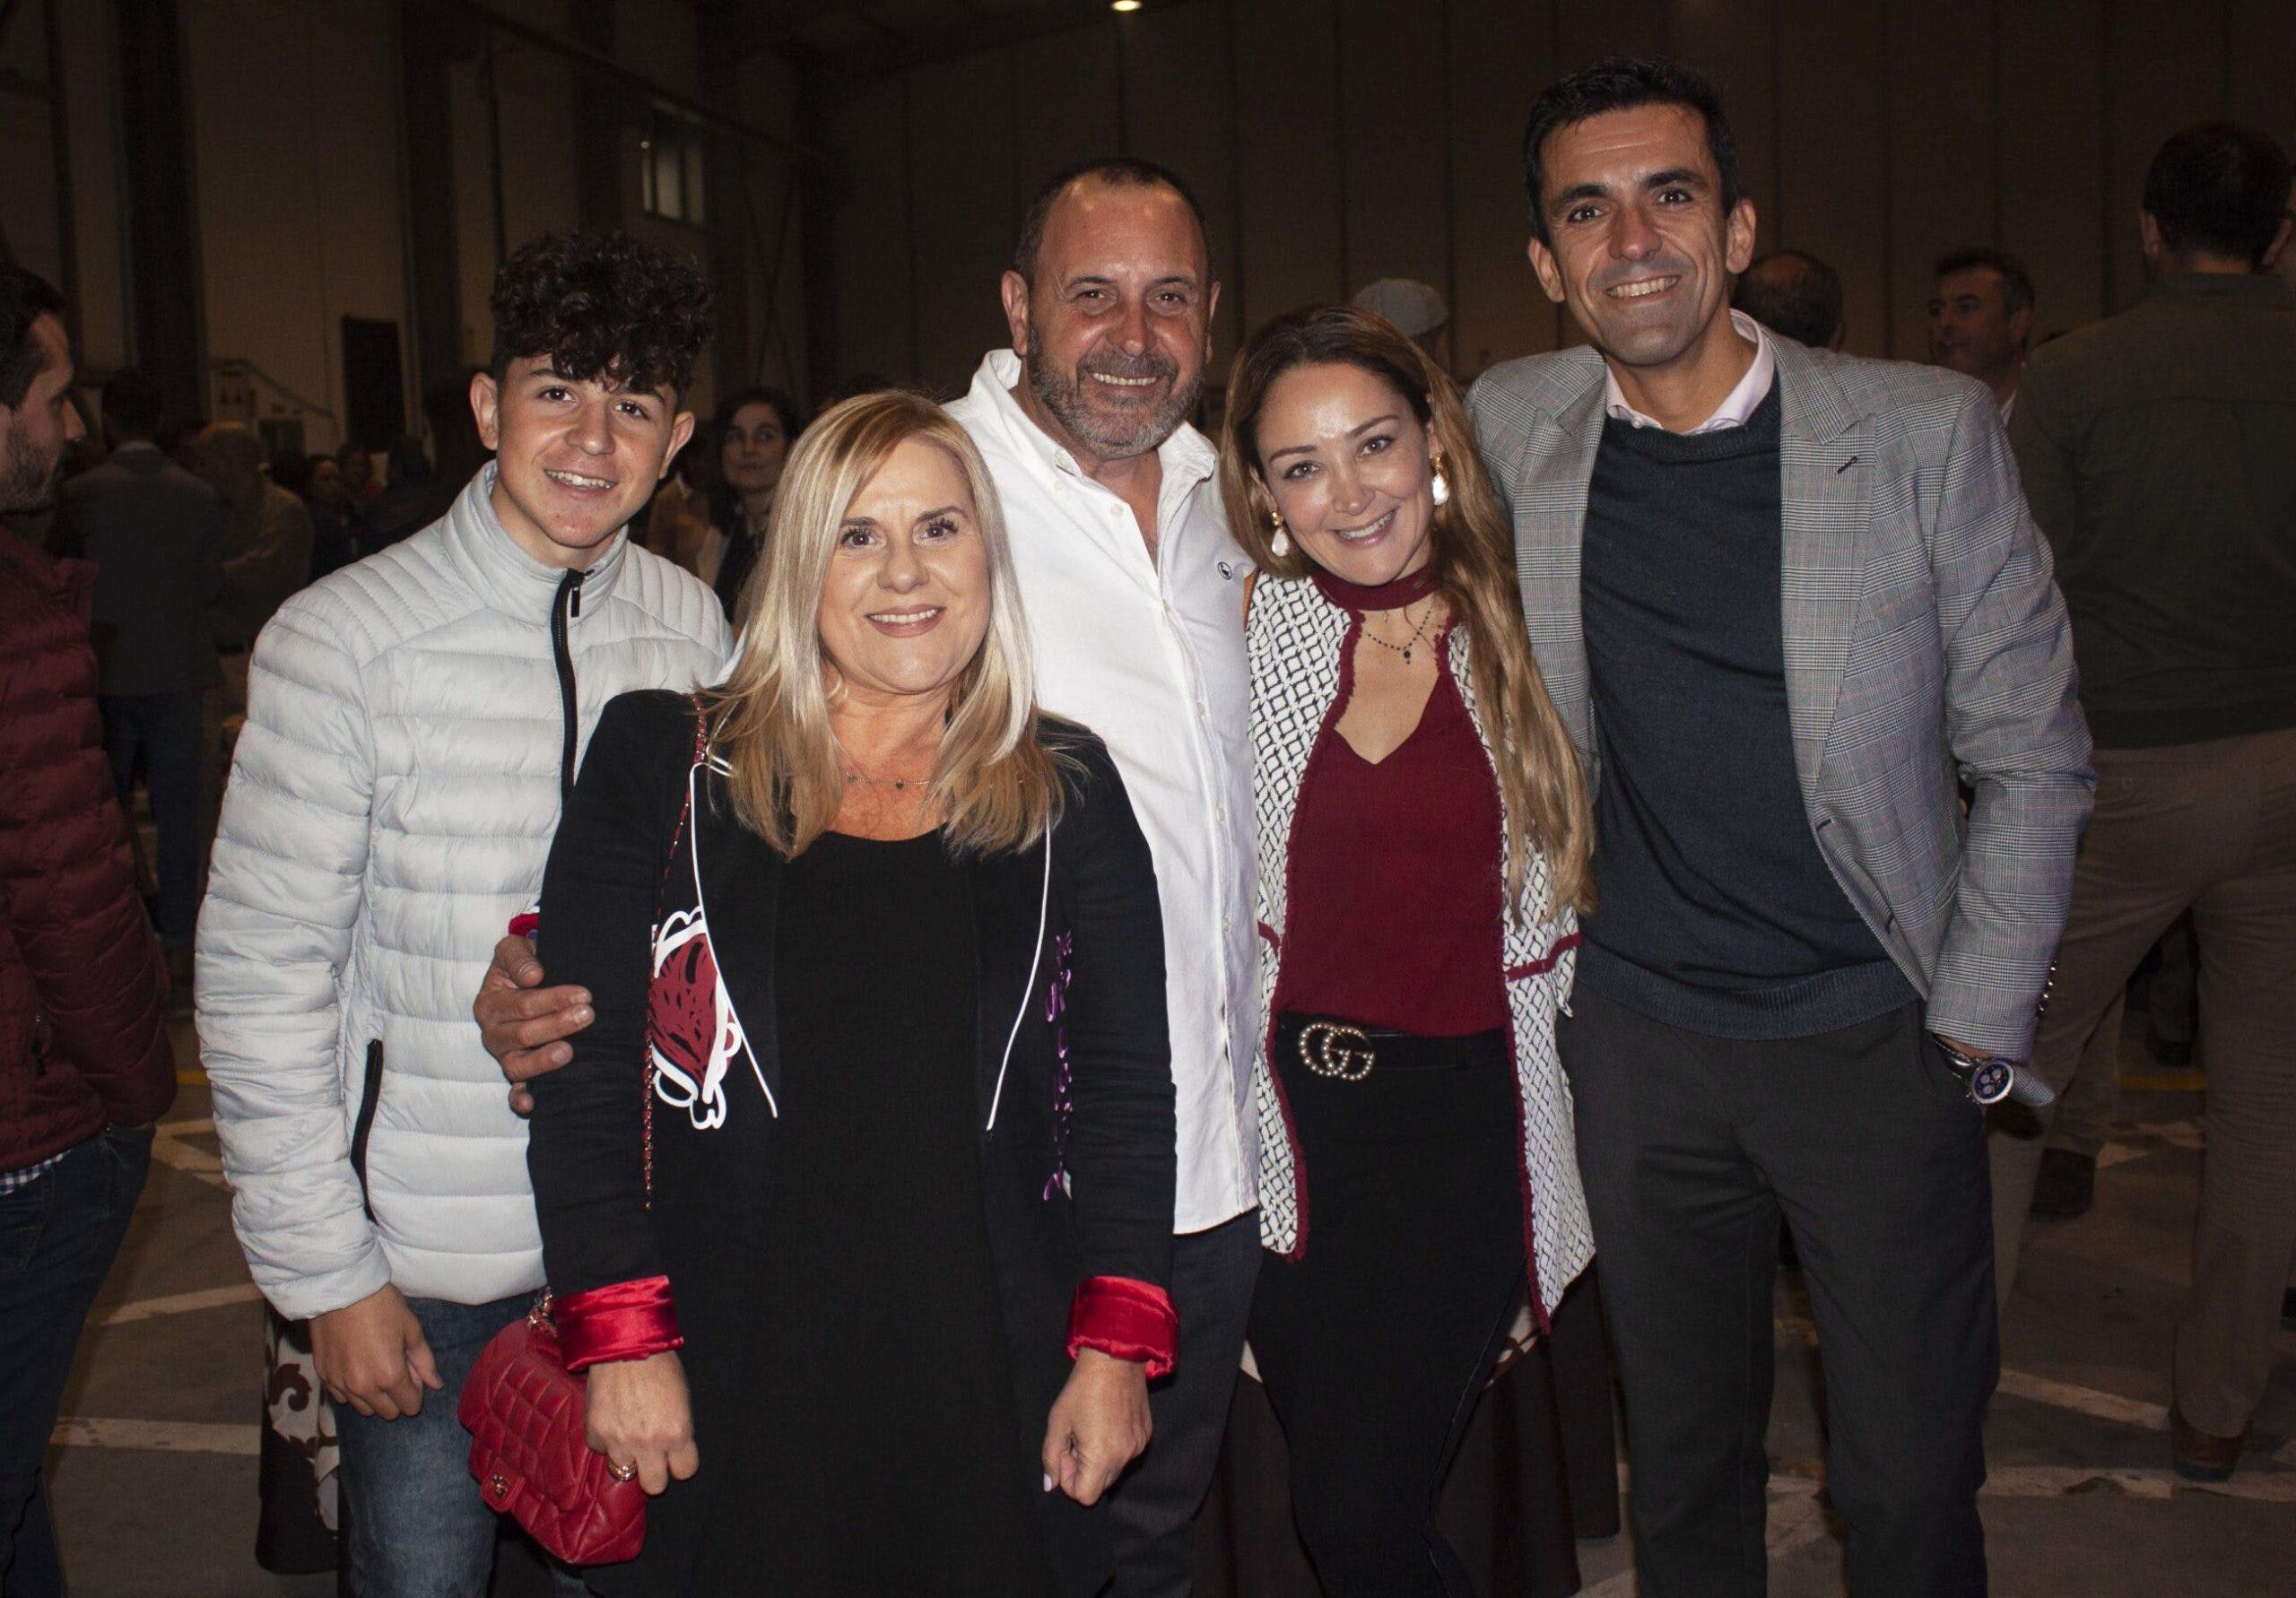 Image of Gerente Jaime Perez ccentro junto a invitados 1 scaled in Cosentino Center Vigo undertakes a beautiful renovation - Cosentino